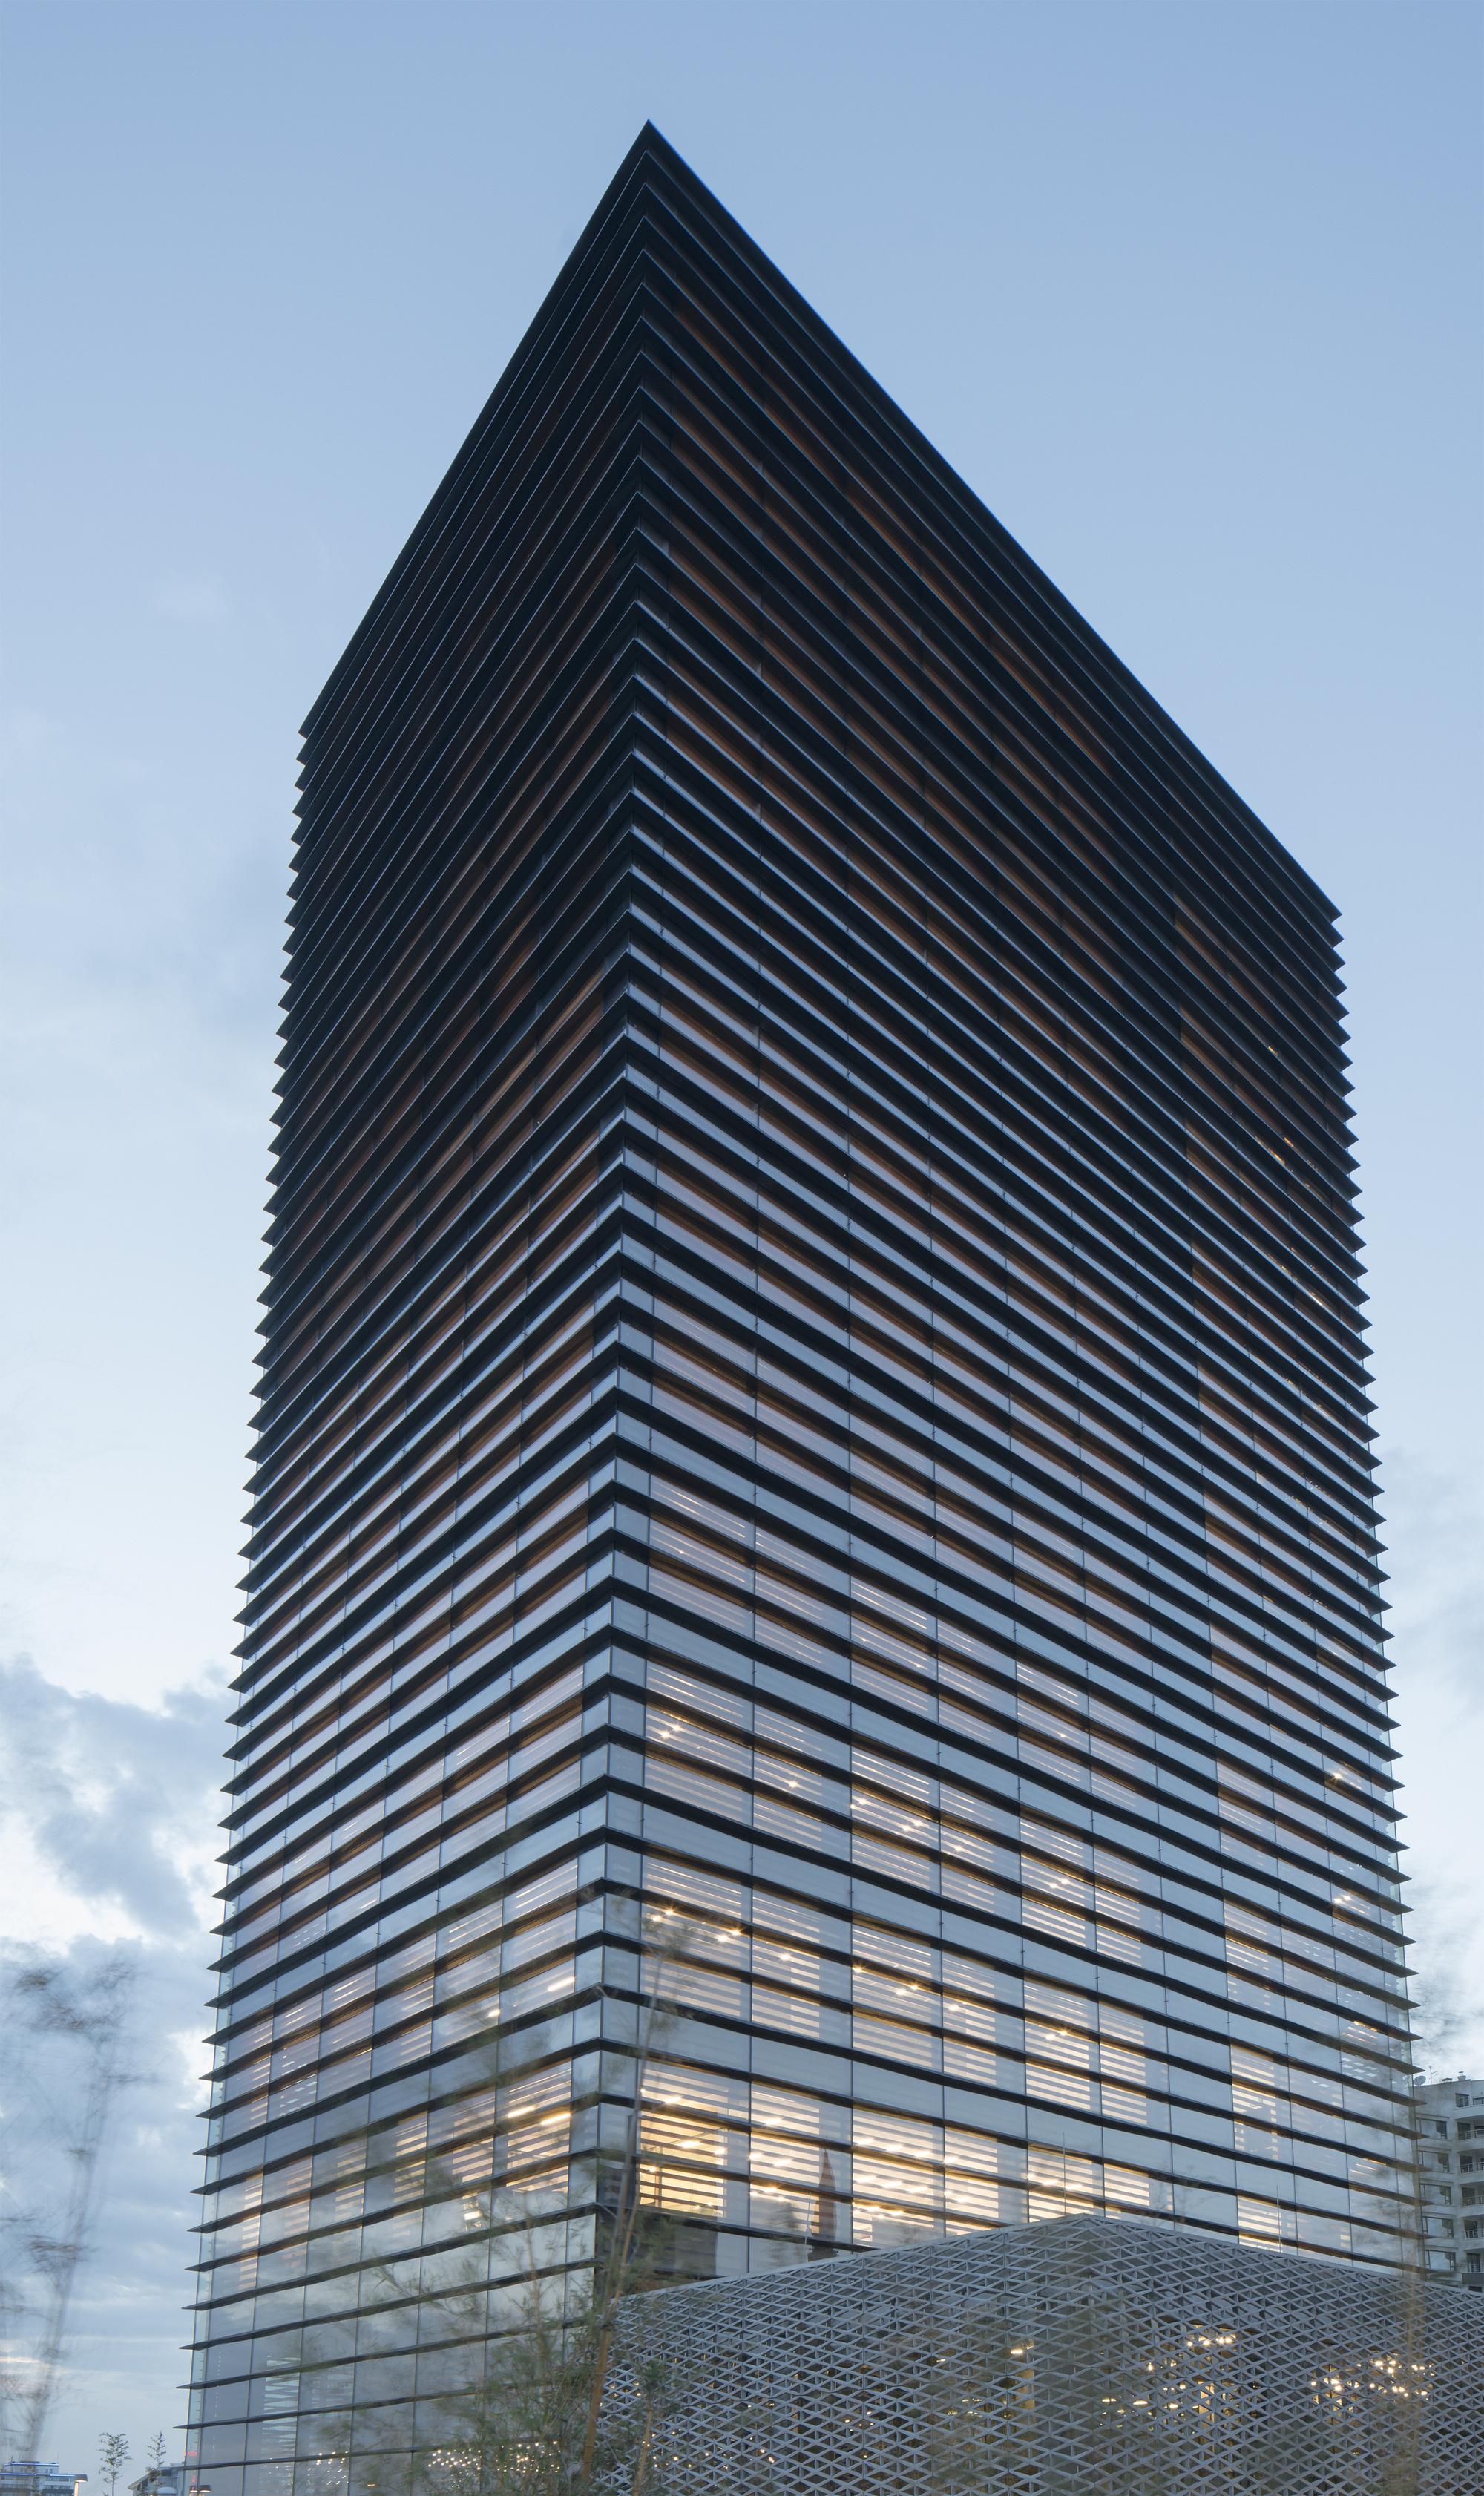 Gallery Of Ankara Office Tower Anmahian Winton